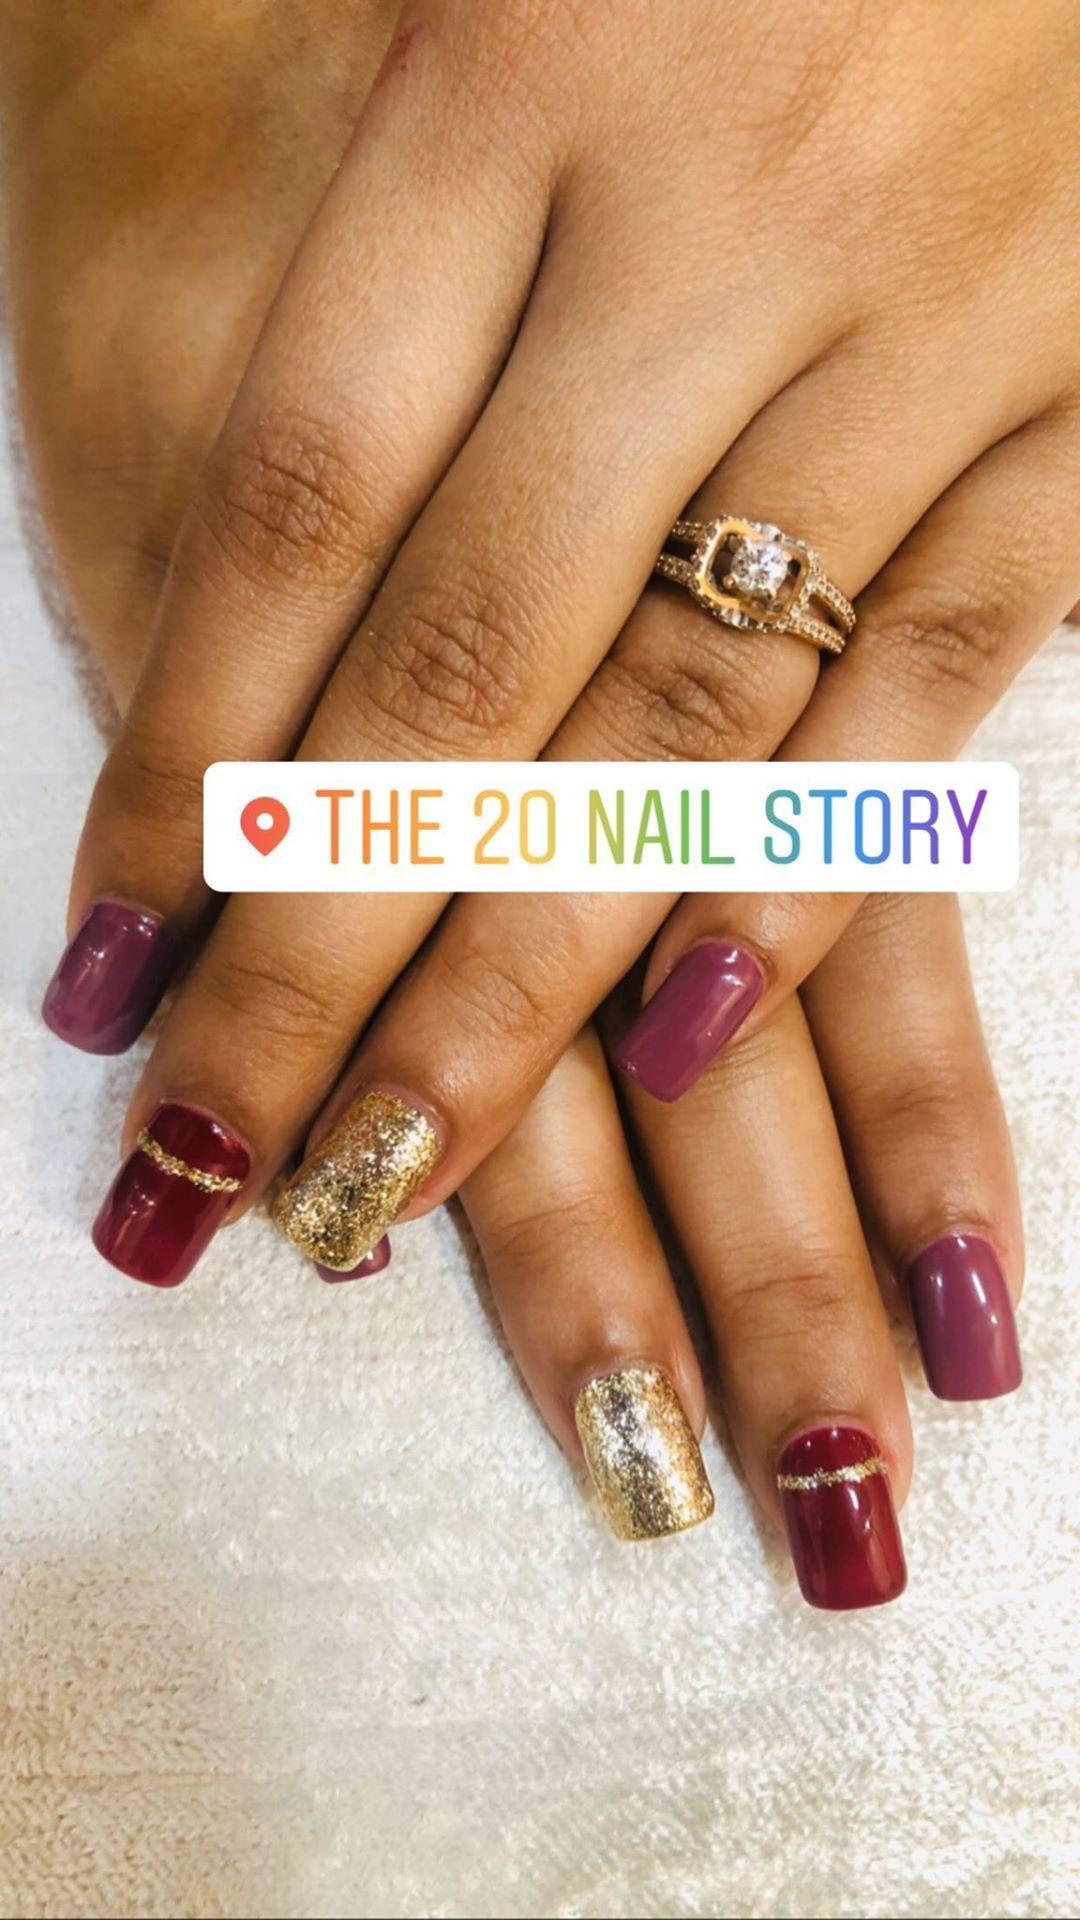 Nail Art Designs For Me Best Nail Salon Latest Nail Designs Fun Nails